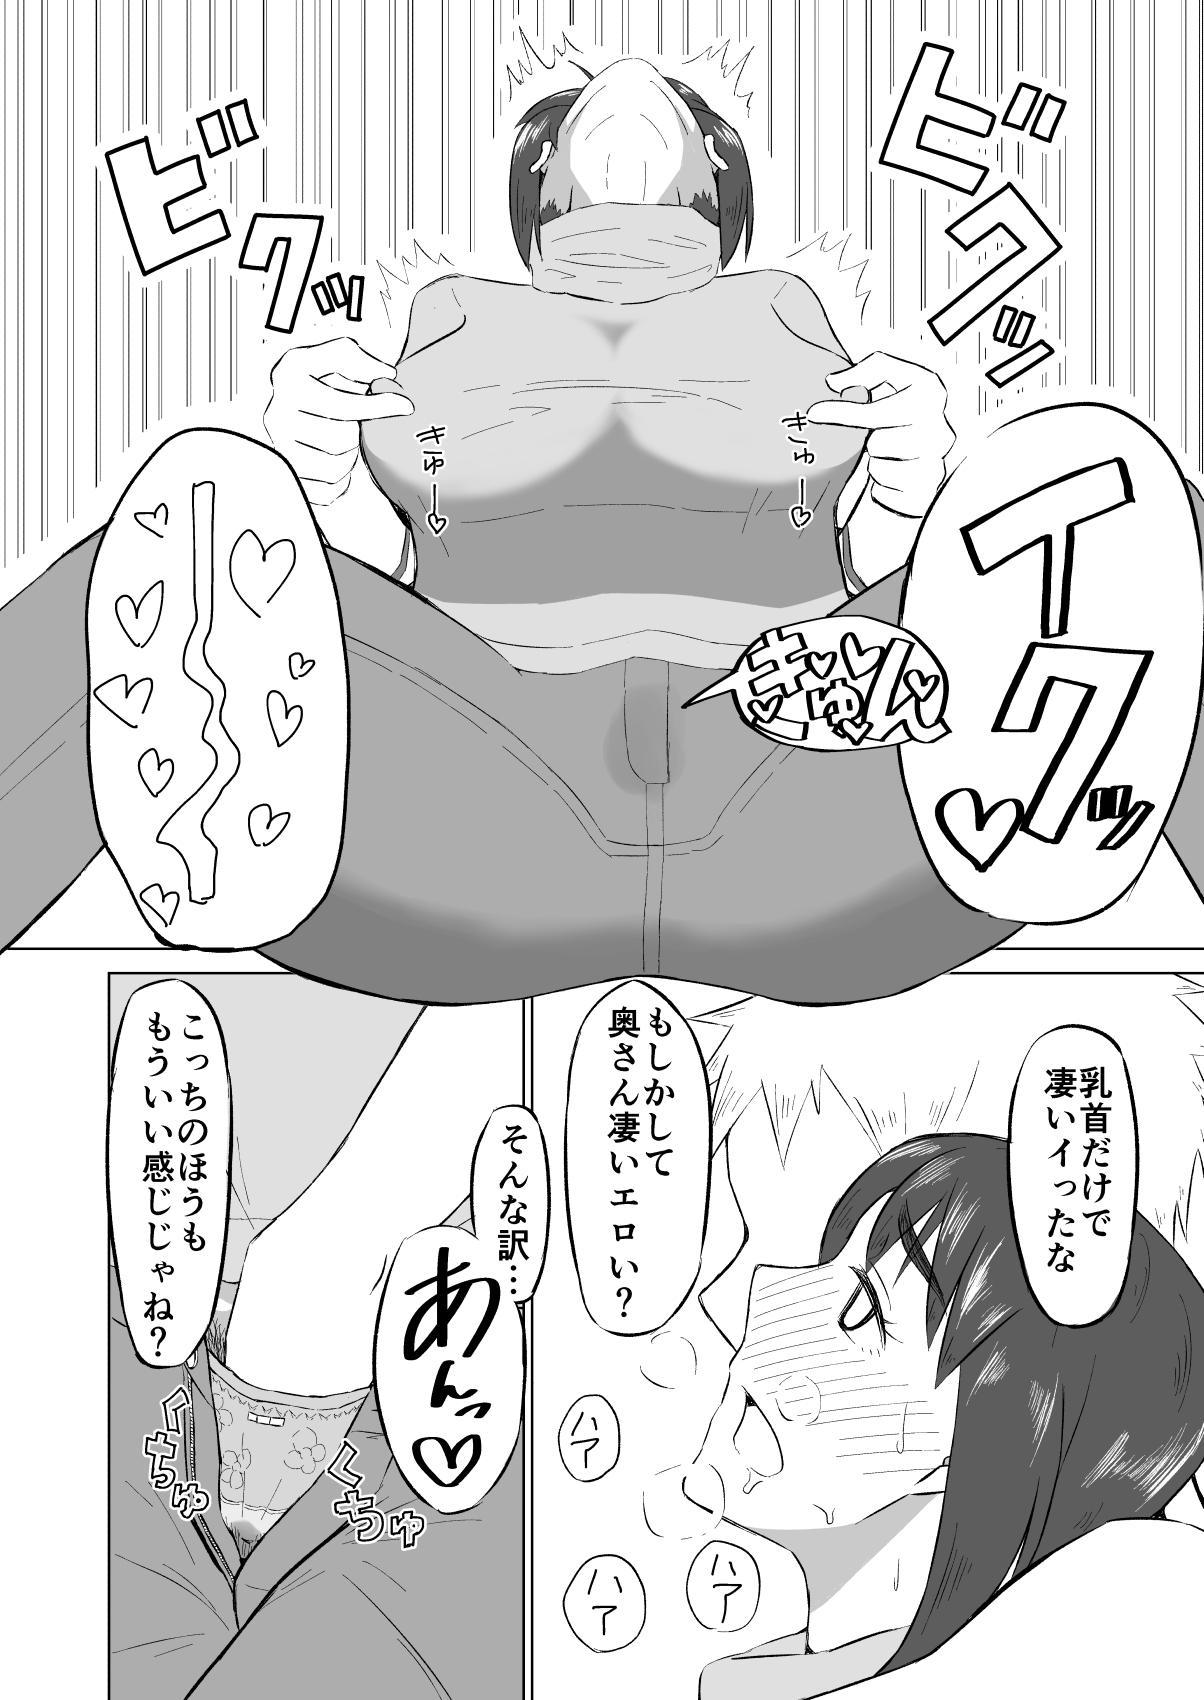 Hitozuma ga Off-kai de Omochikaerare Hon 7